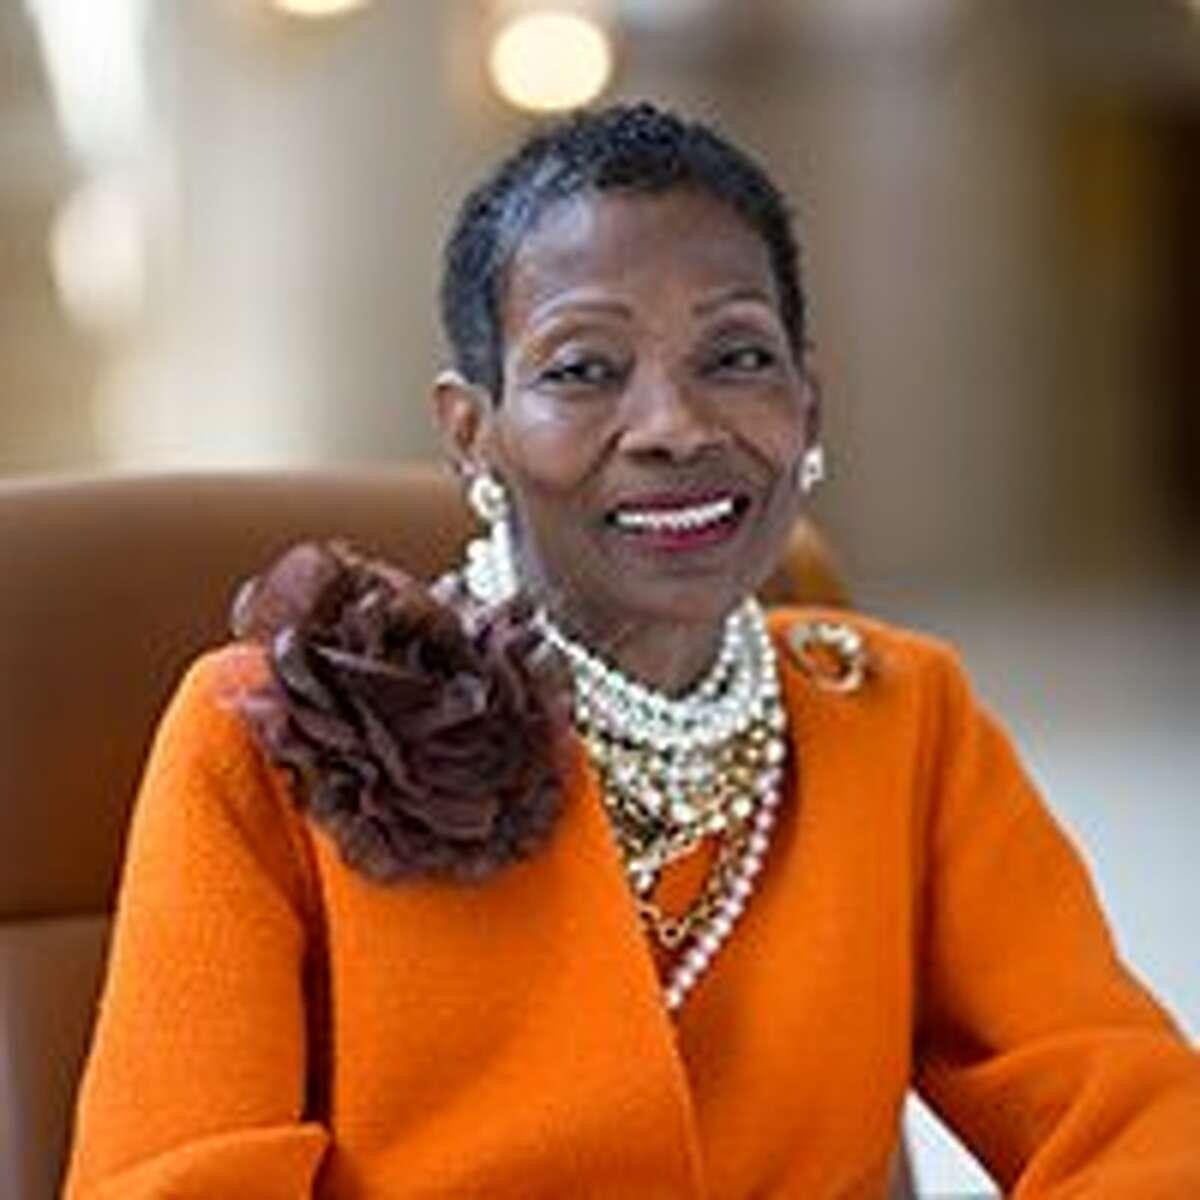 Linda Crayton is an SFO commissioner.